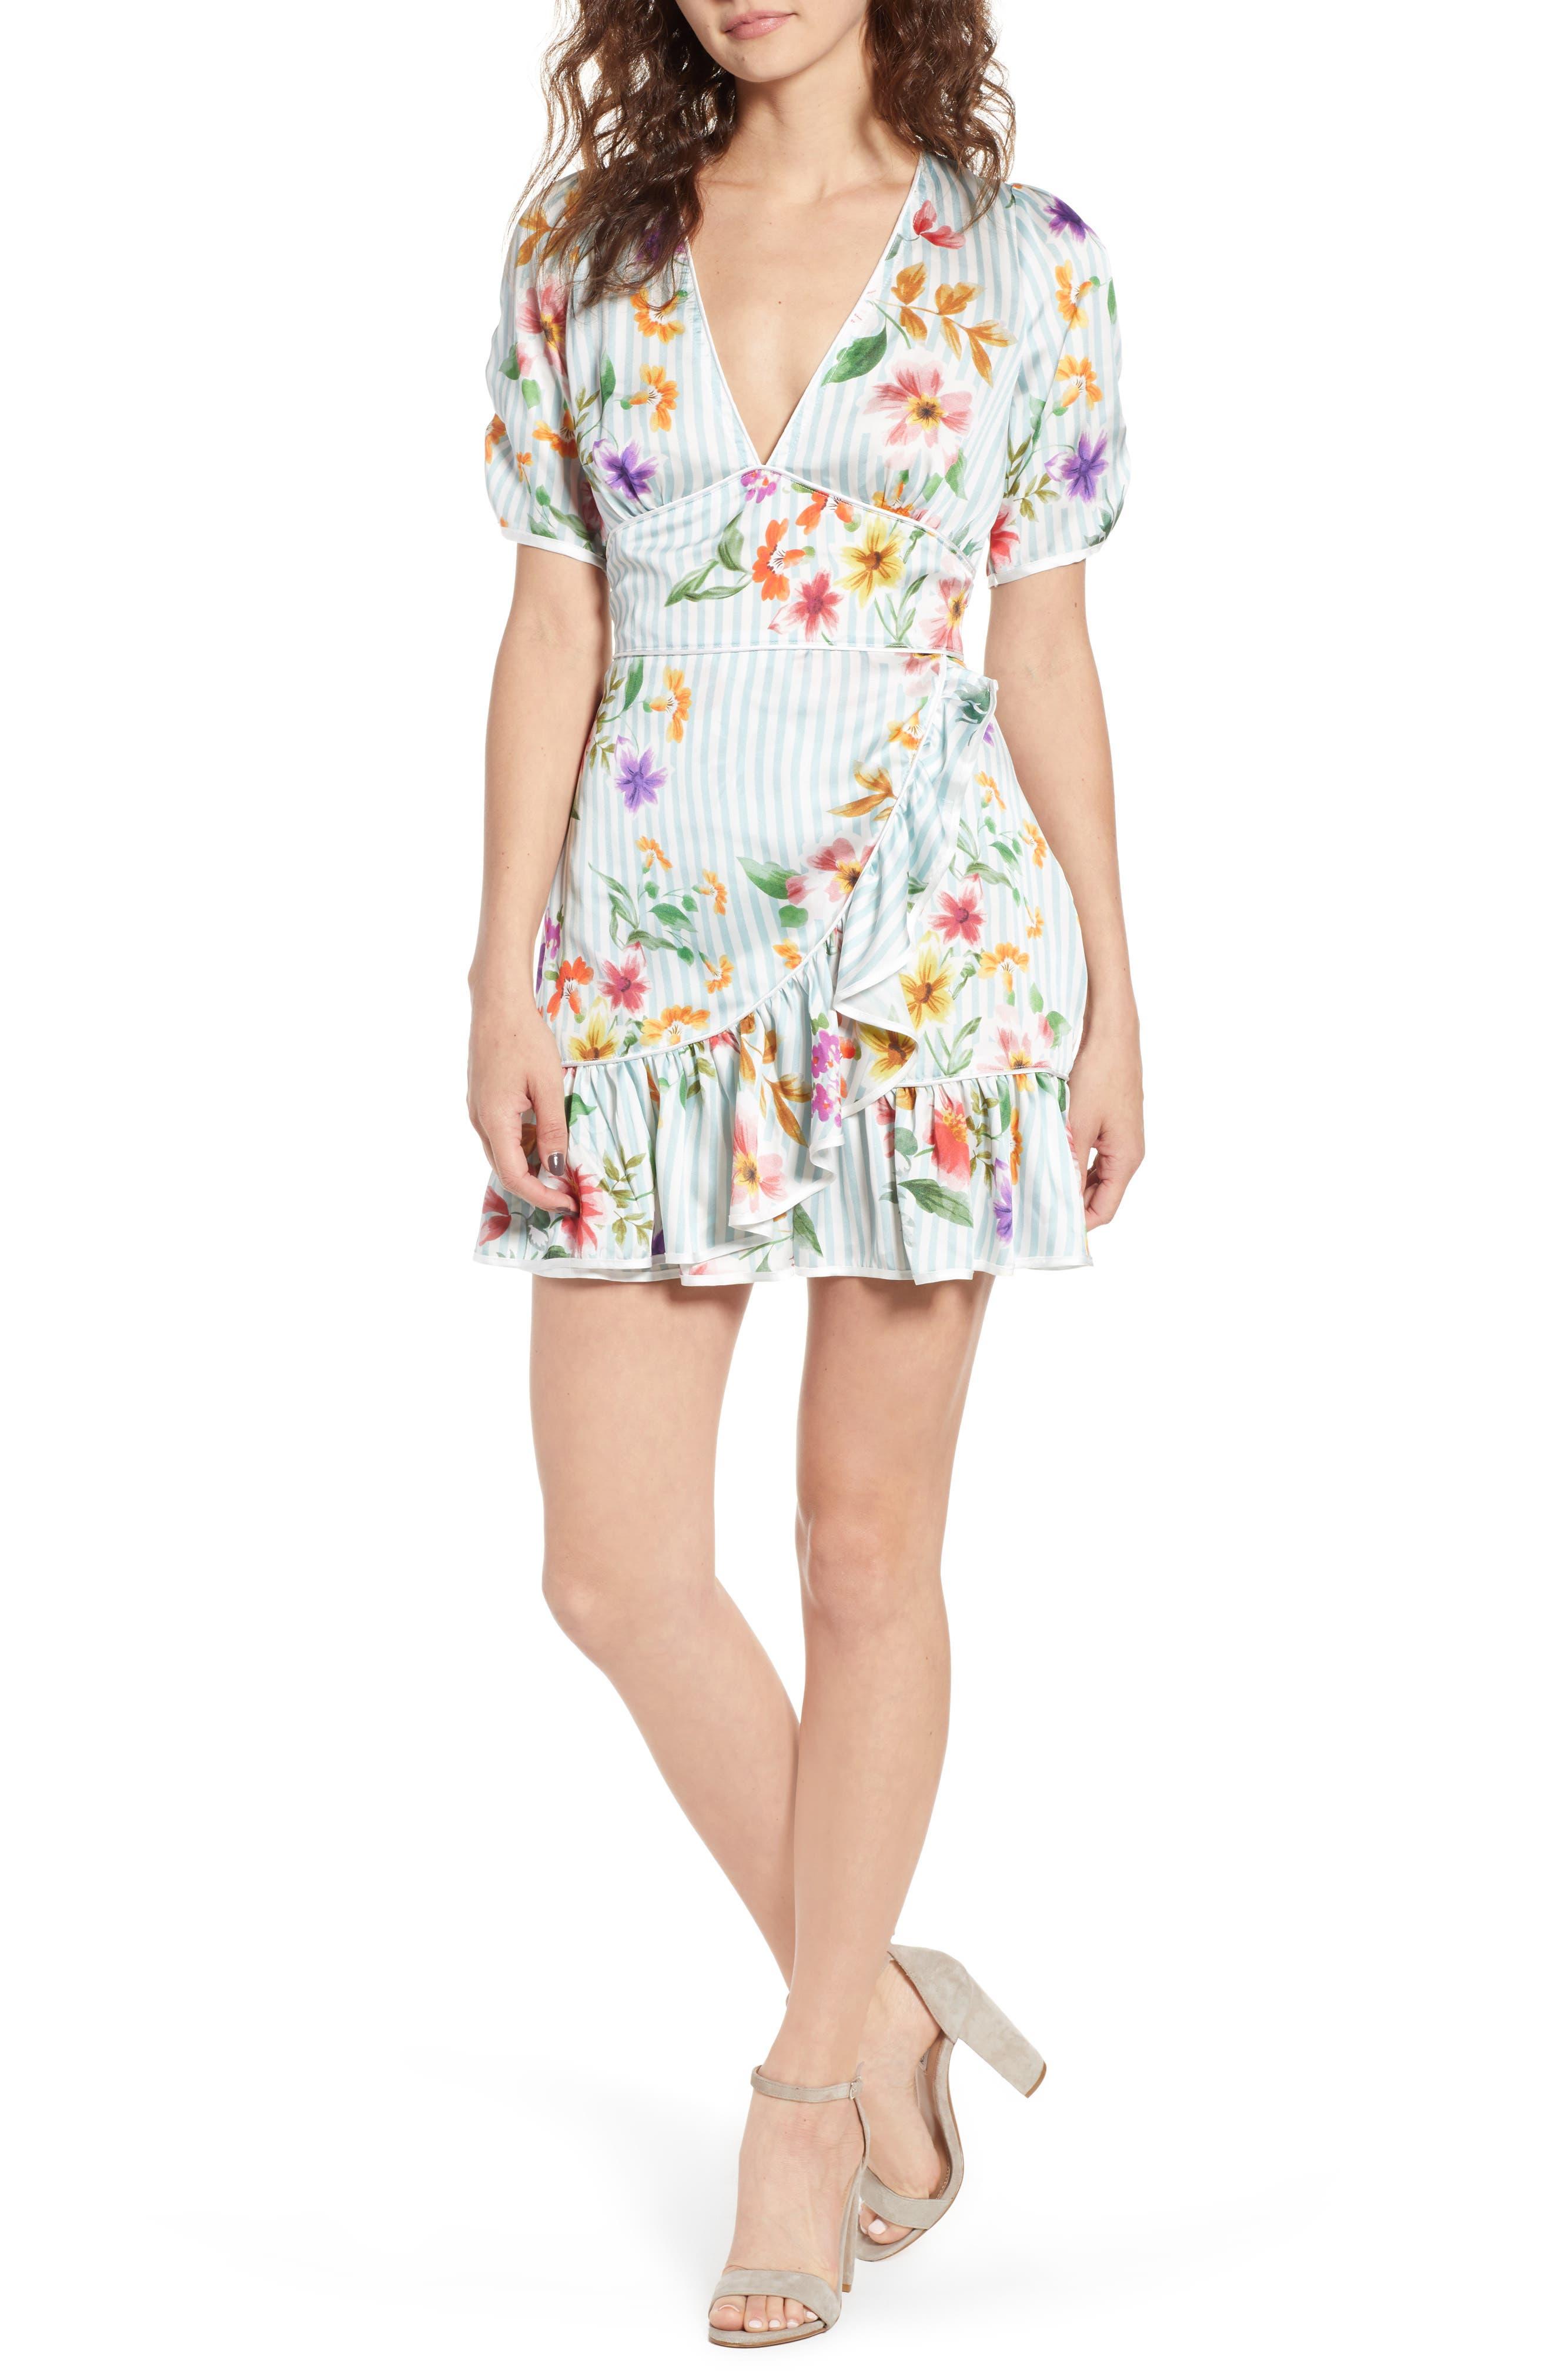 Barb Ruffle Dress,                             Main thumbnail 1, color,                             Blue Flowerbed